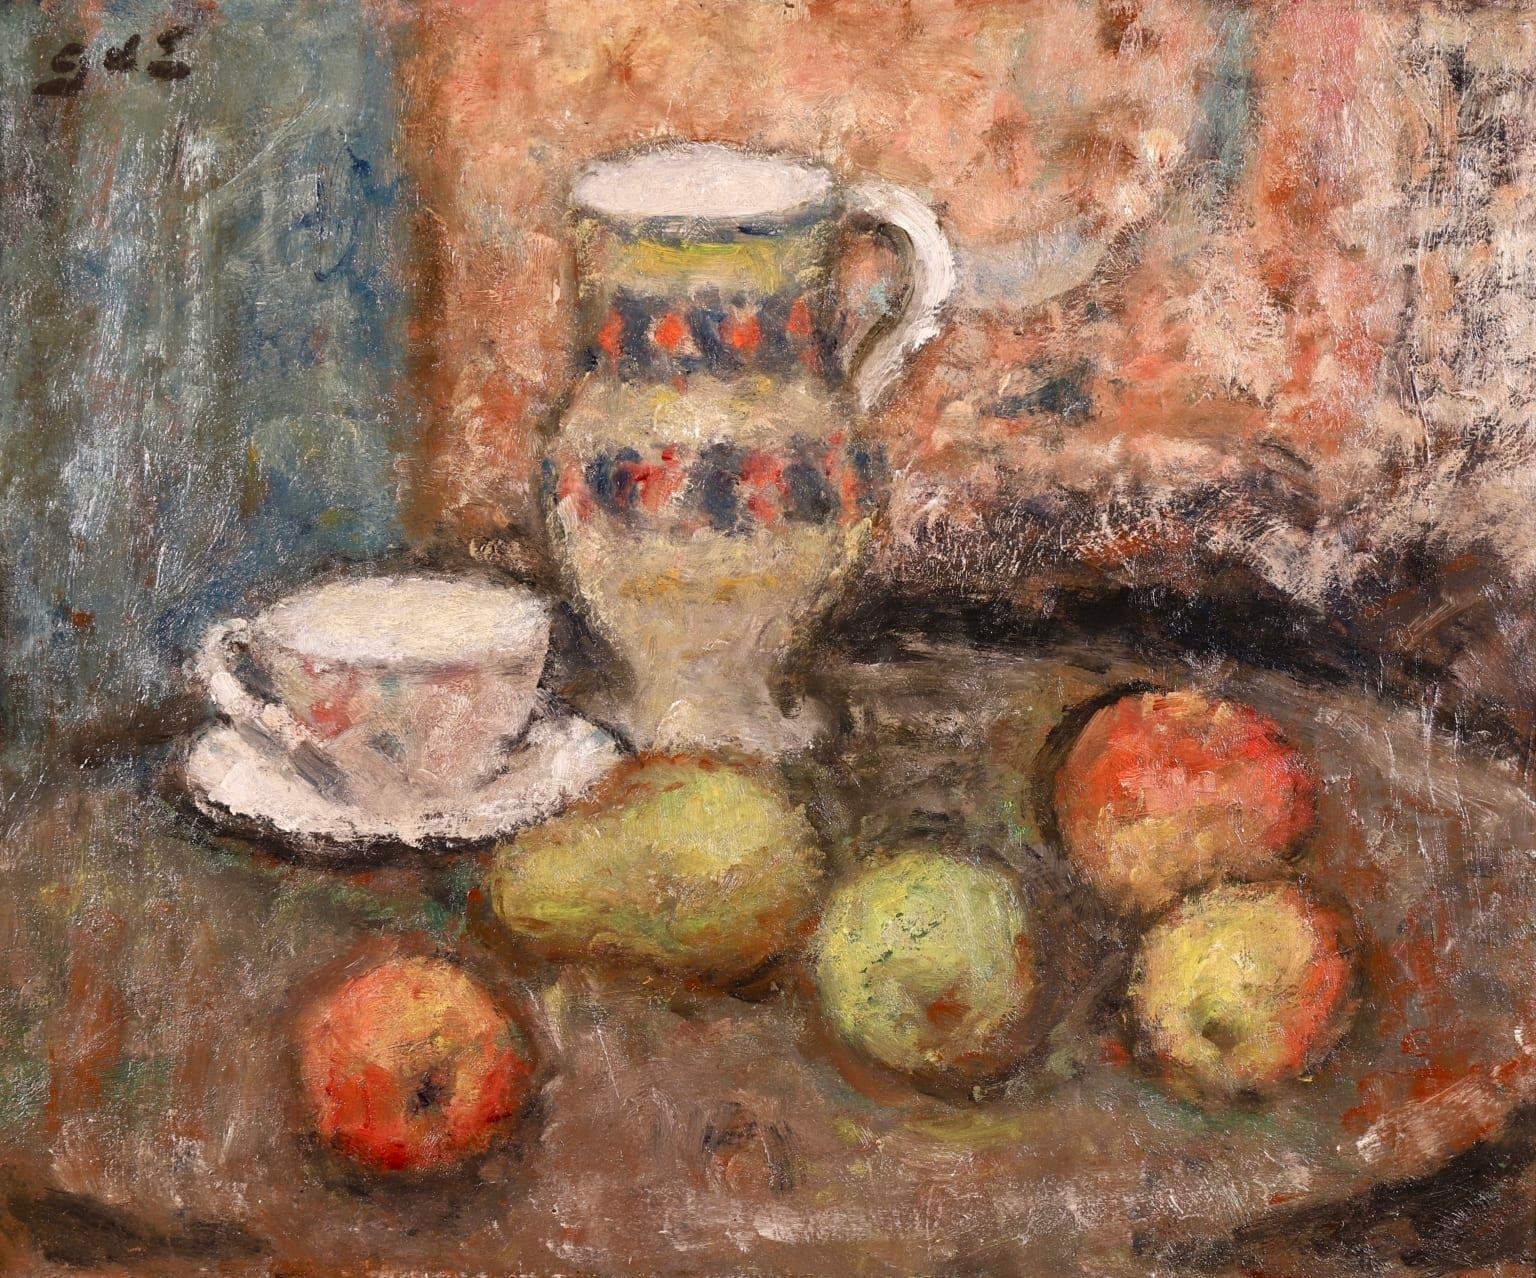 Nature Morte - Post Impressionist Oil, Still Life of Fruit by Georges D'Espagnat